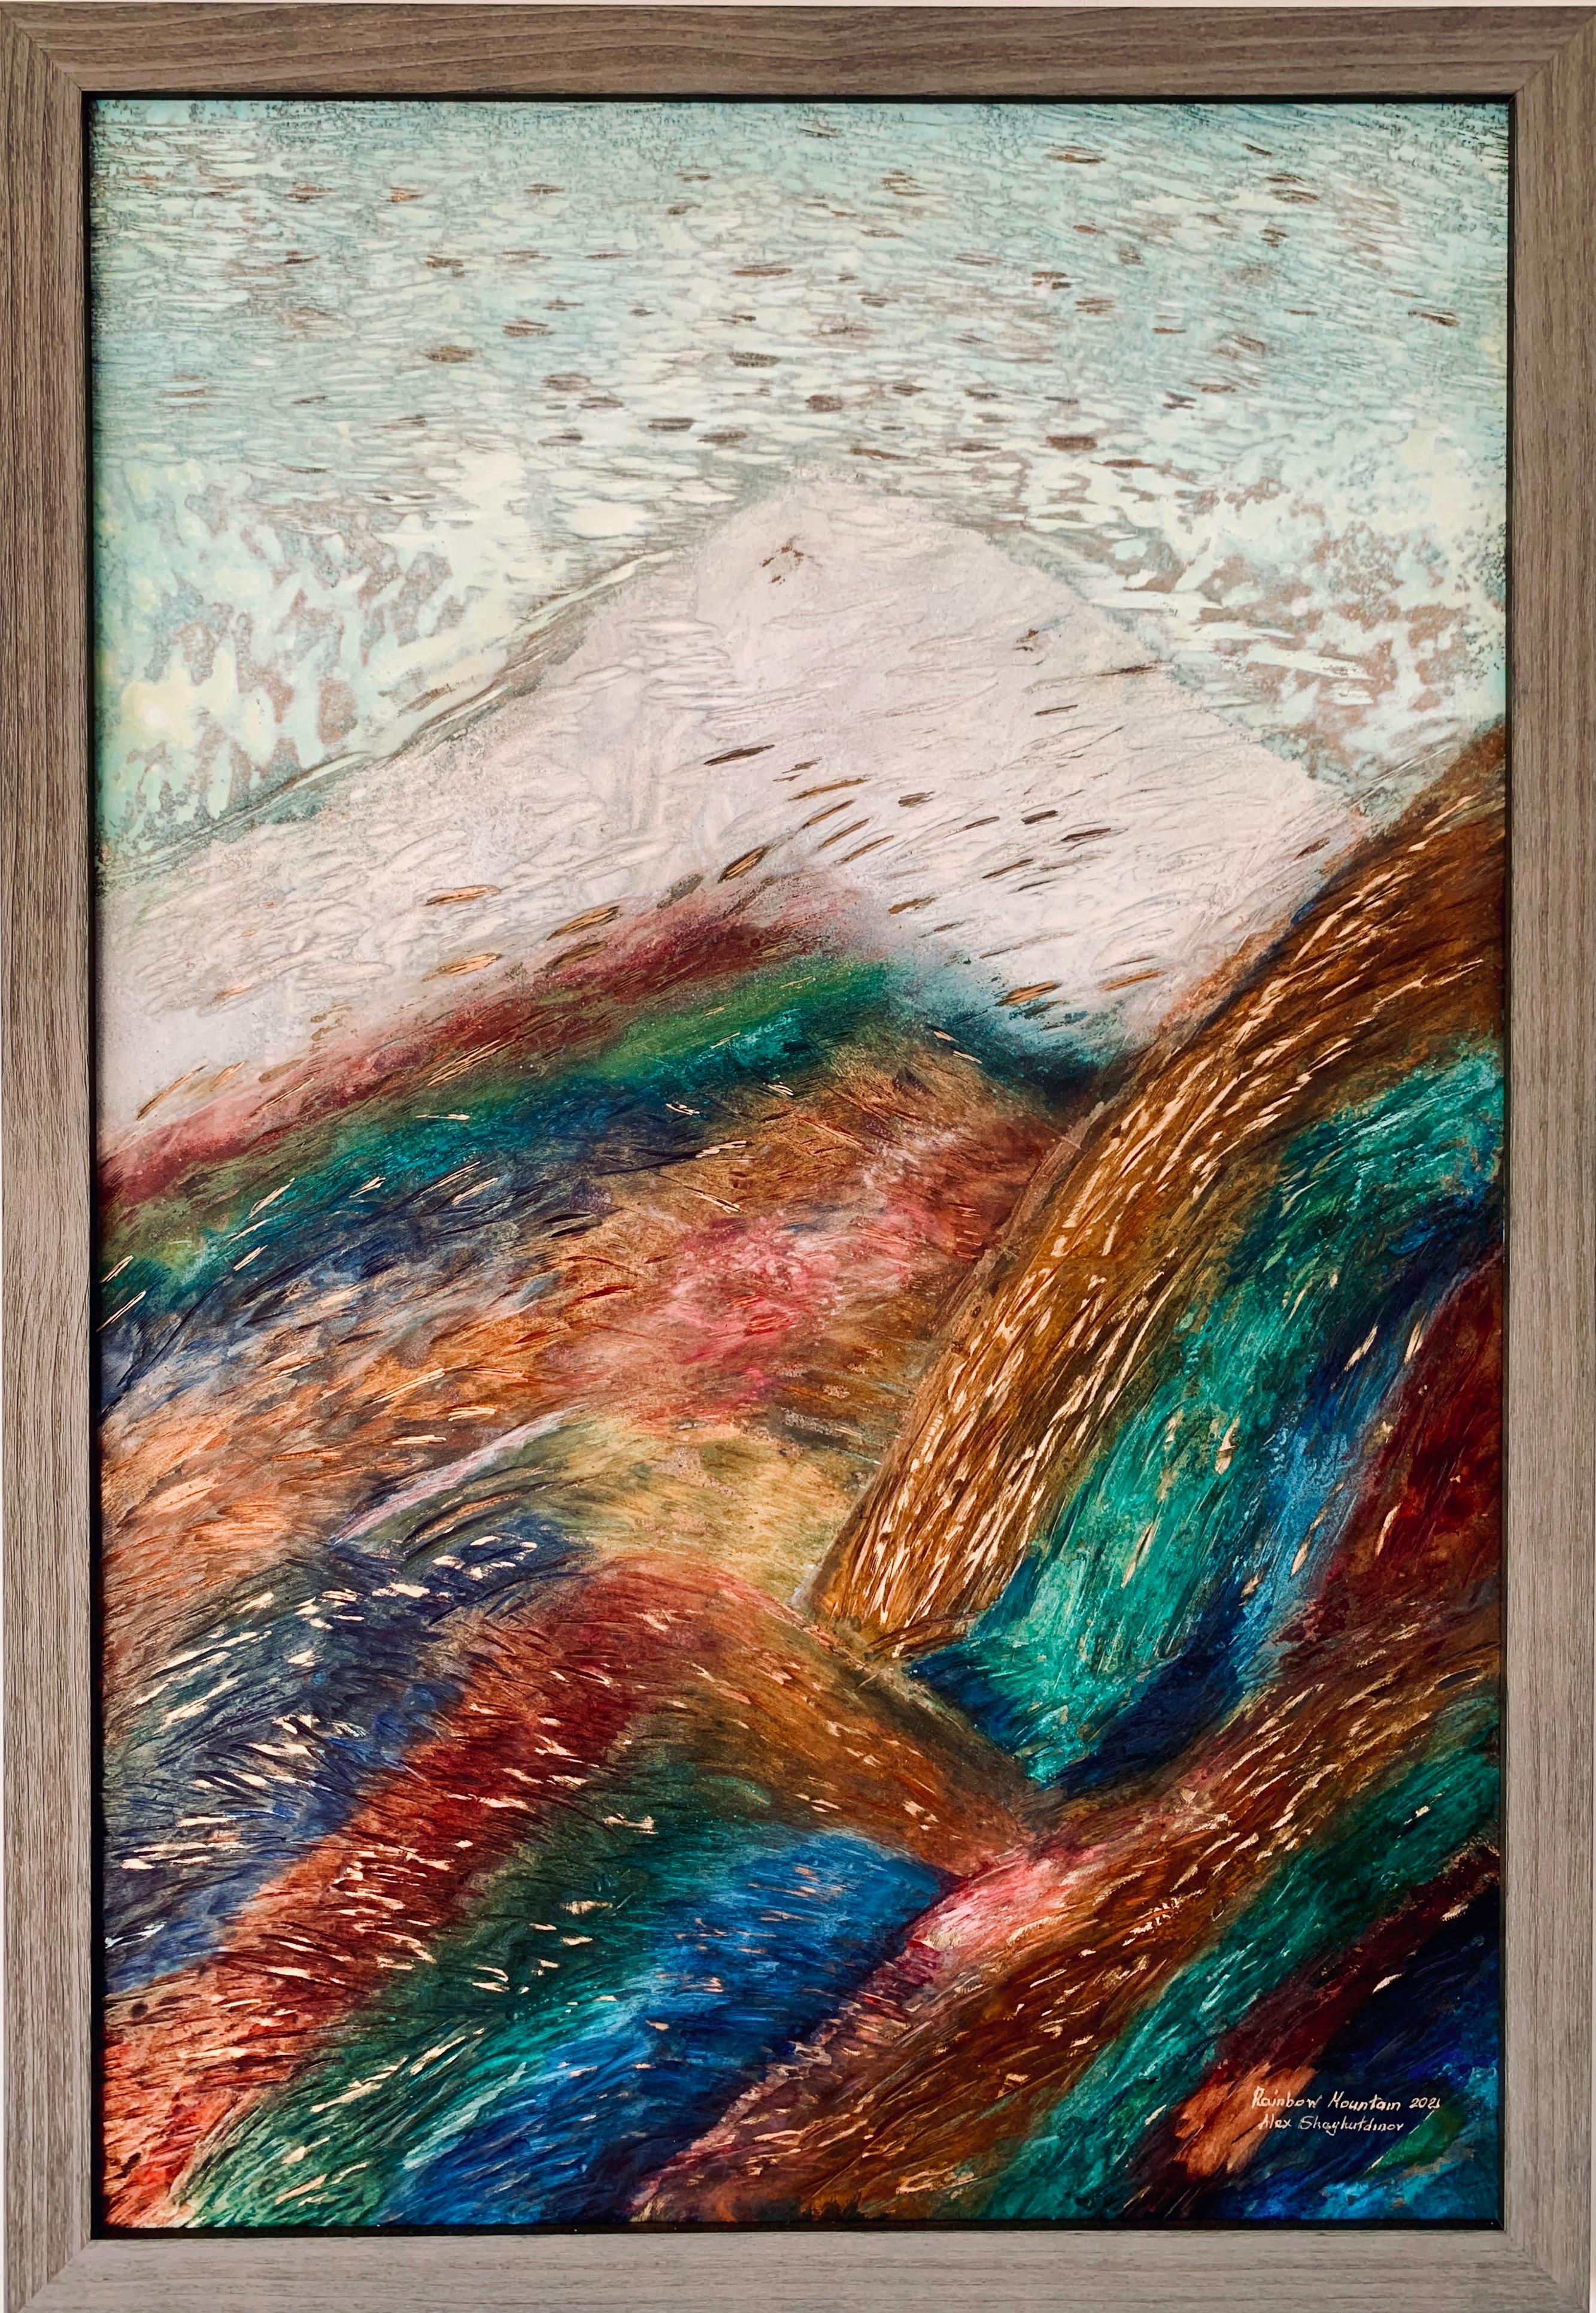 Rainbow Mountain artwork by Alex Shayhutdinov - art listed for sale on Artplode